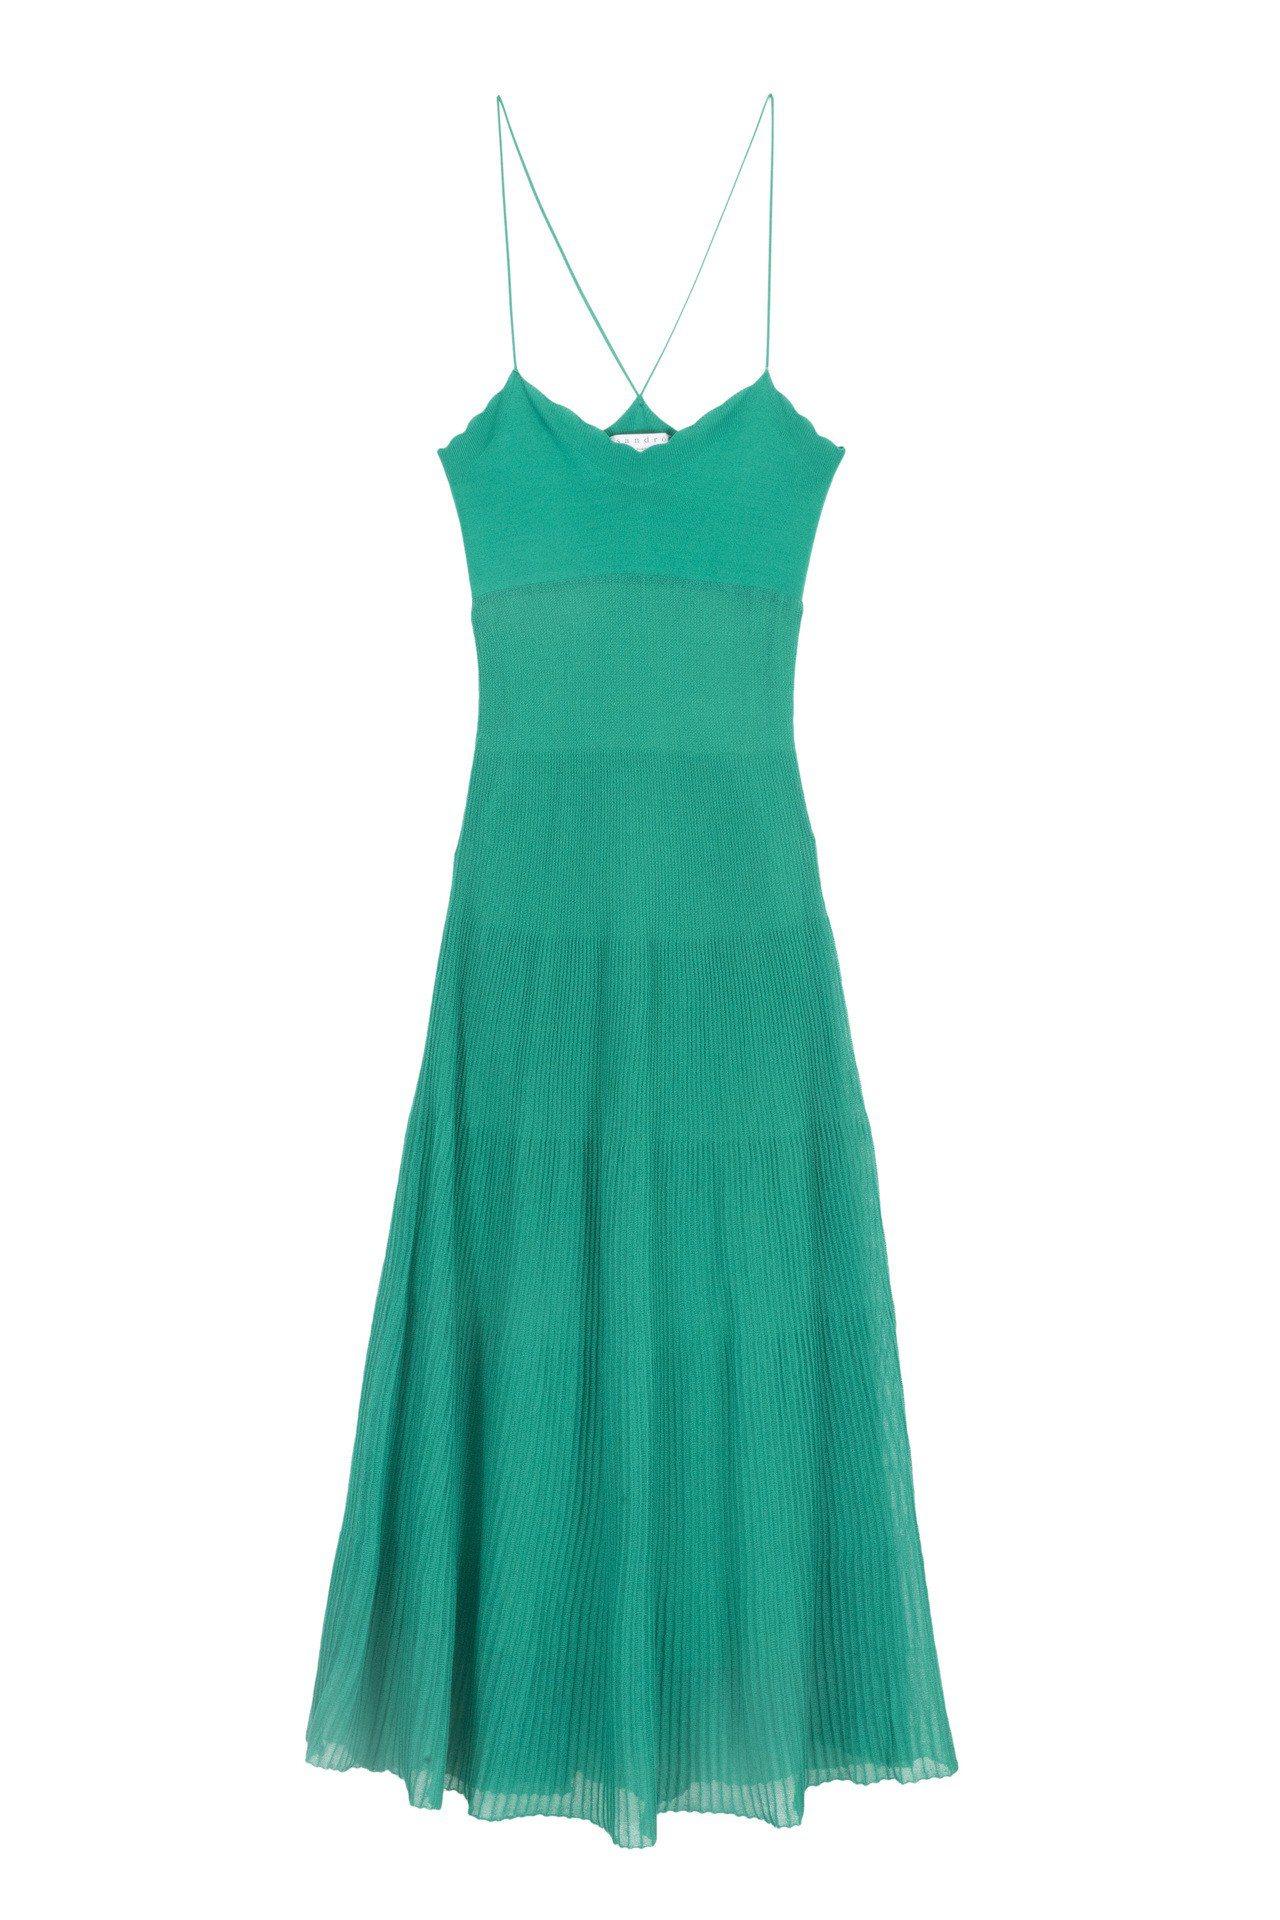 Sandro湖水綠針織連身裙,售價9,970元。圖/Sandro提供